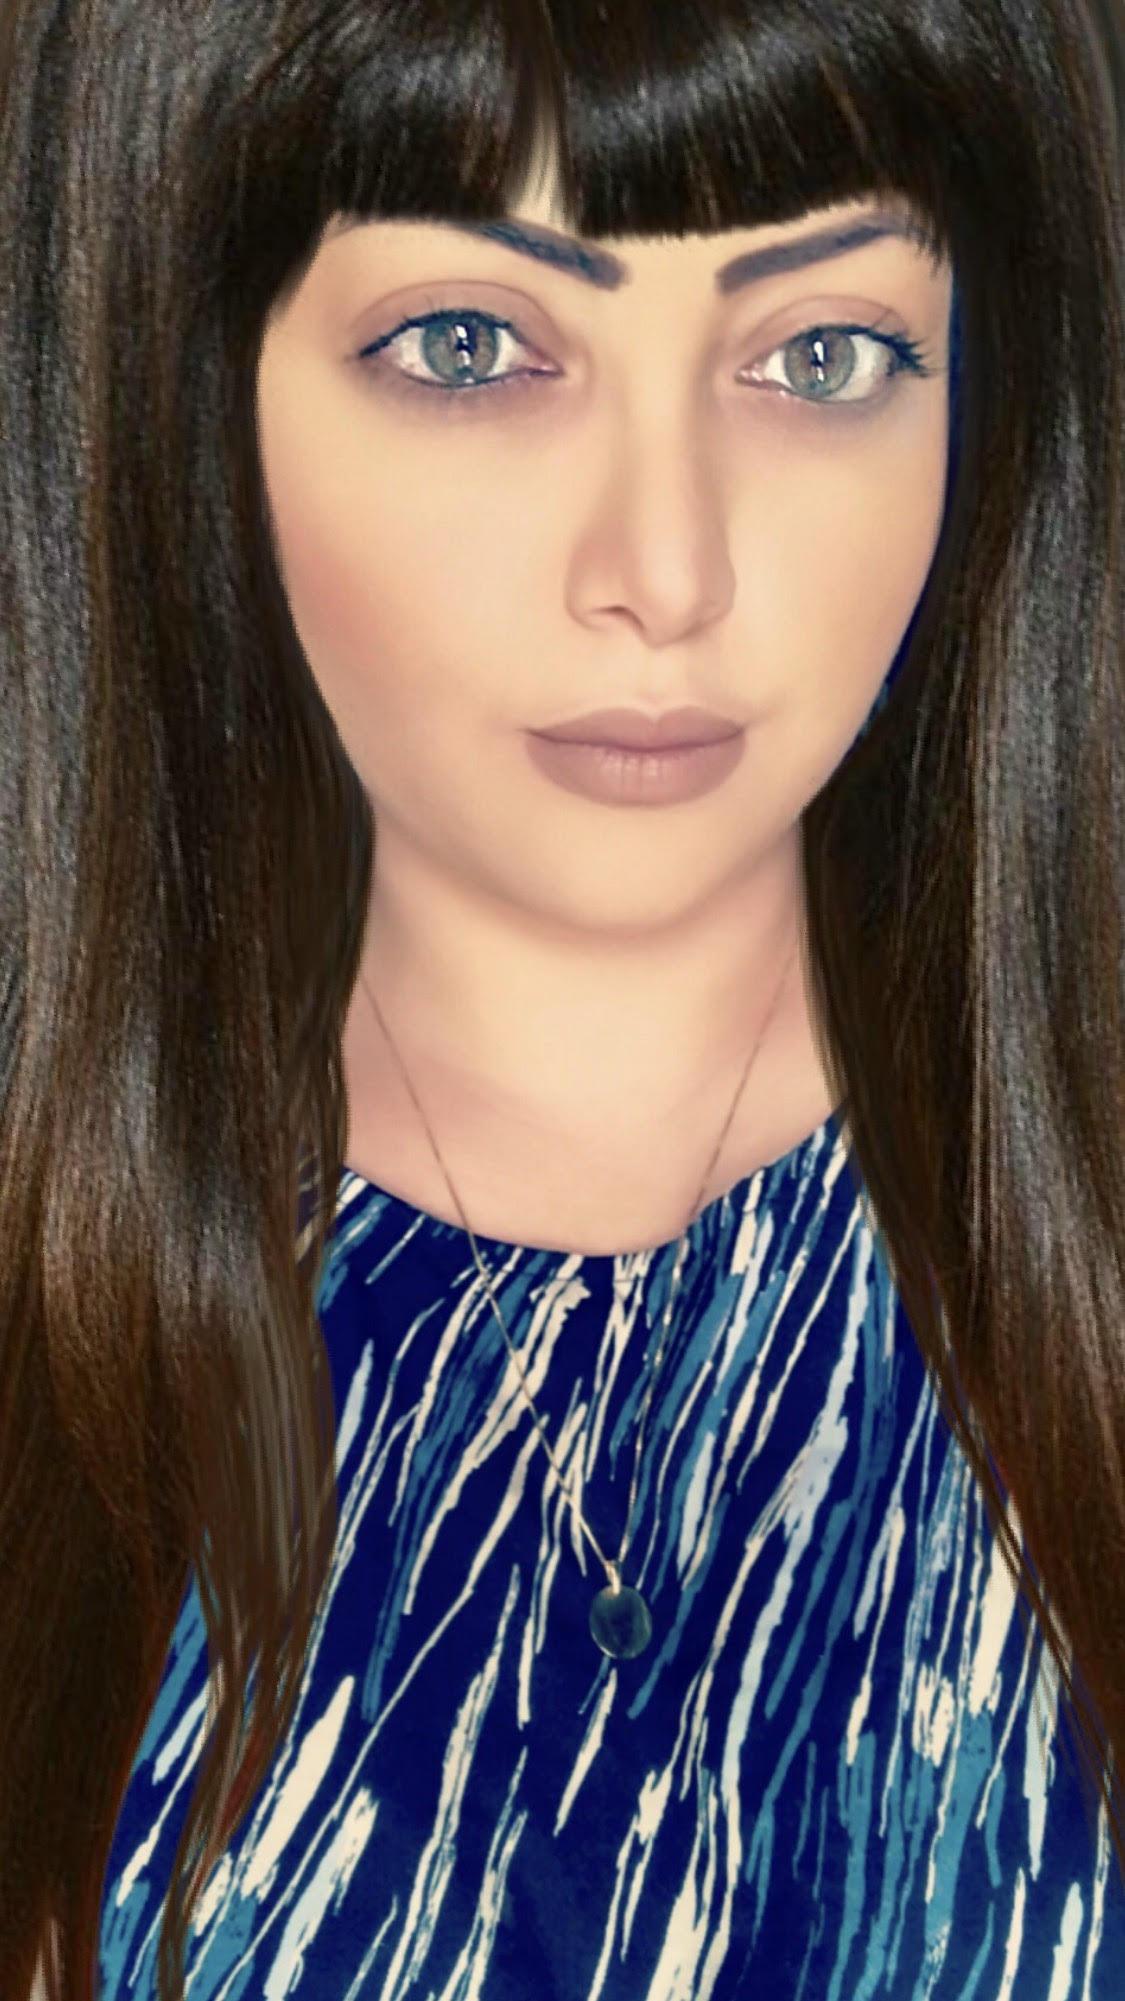 Hadeel Abu Johar: Memory Pictures #3